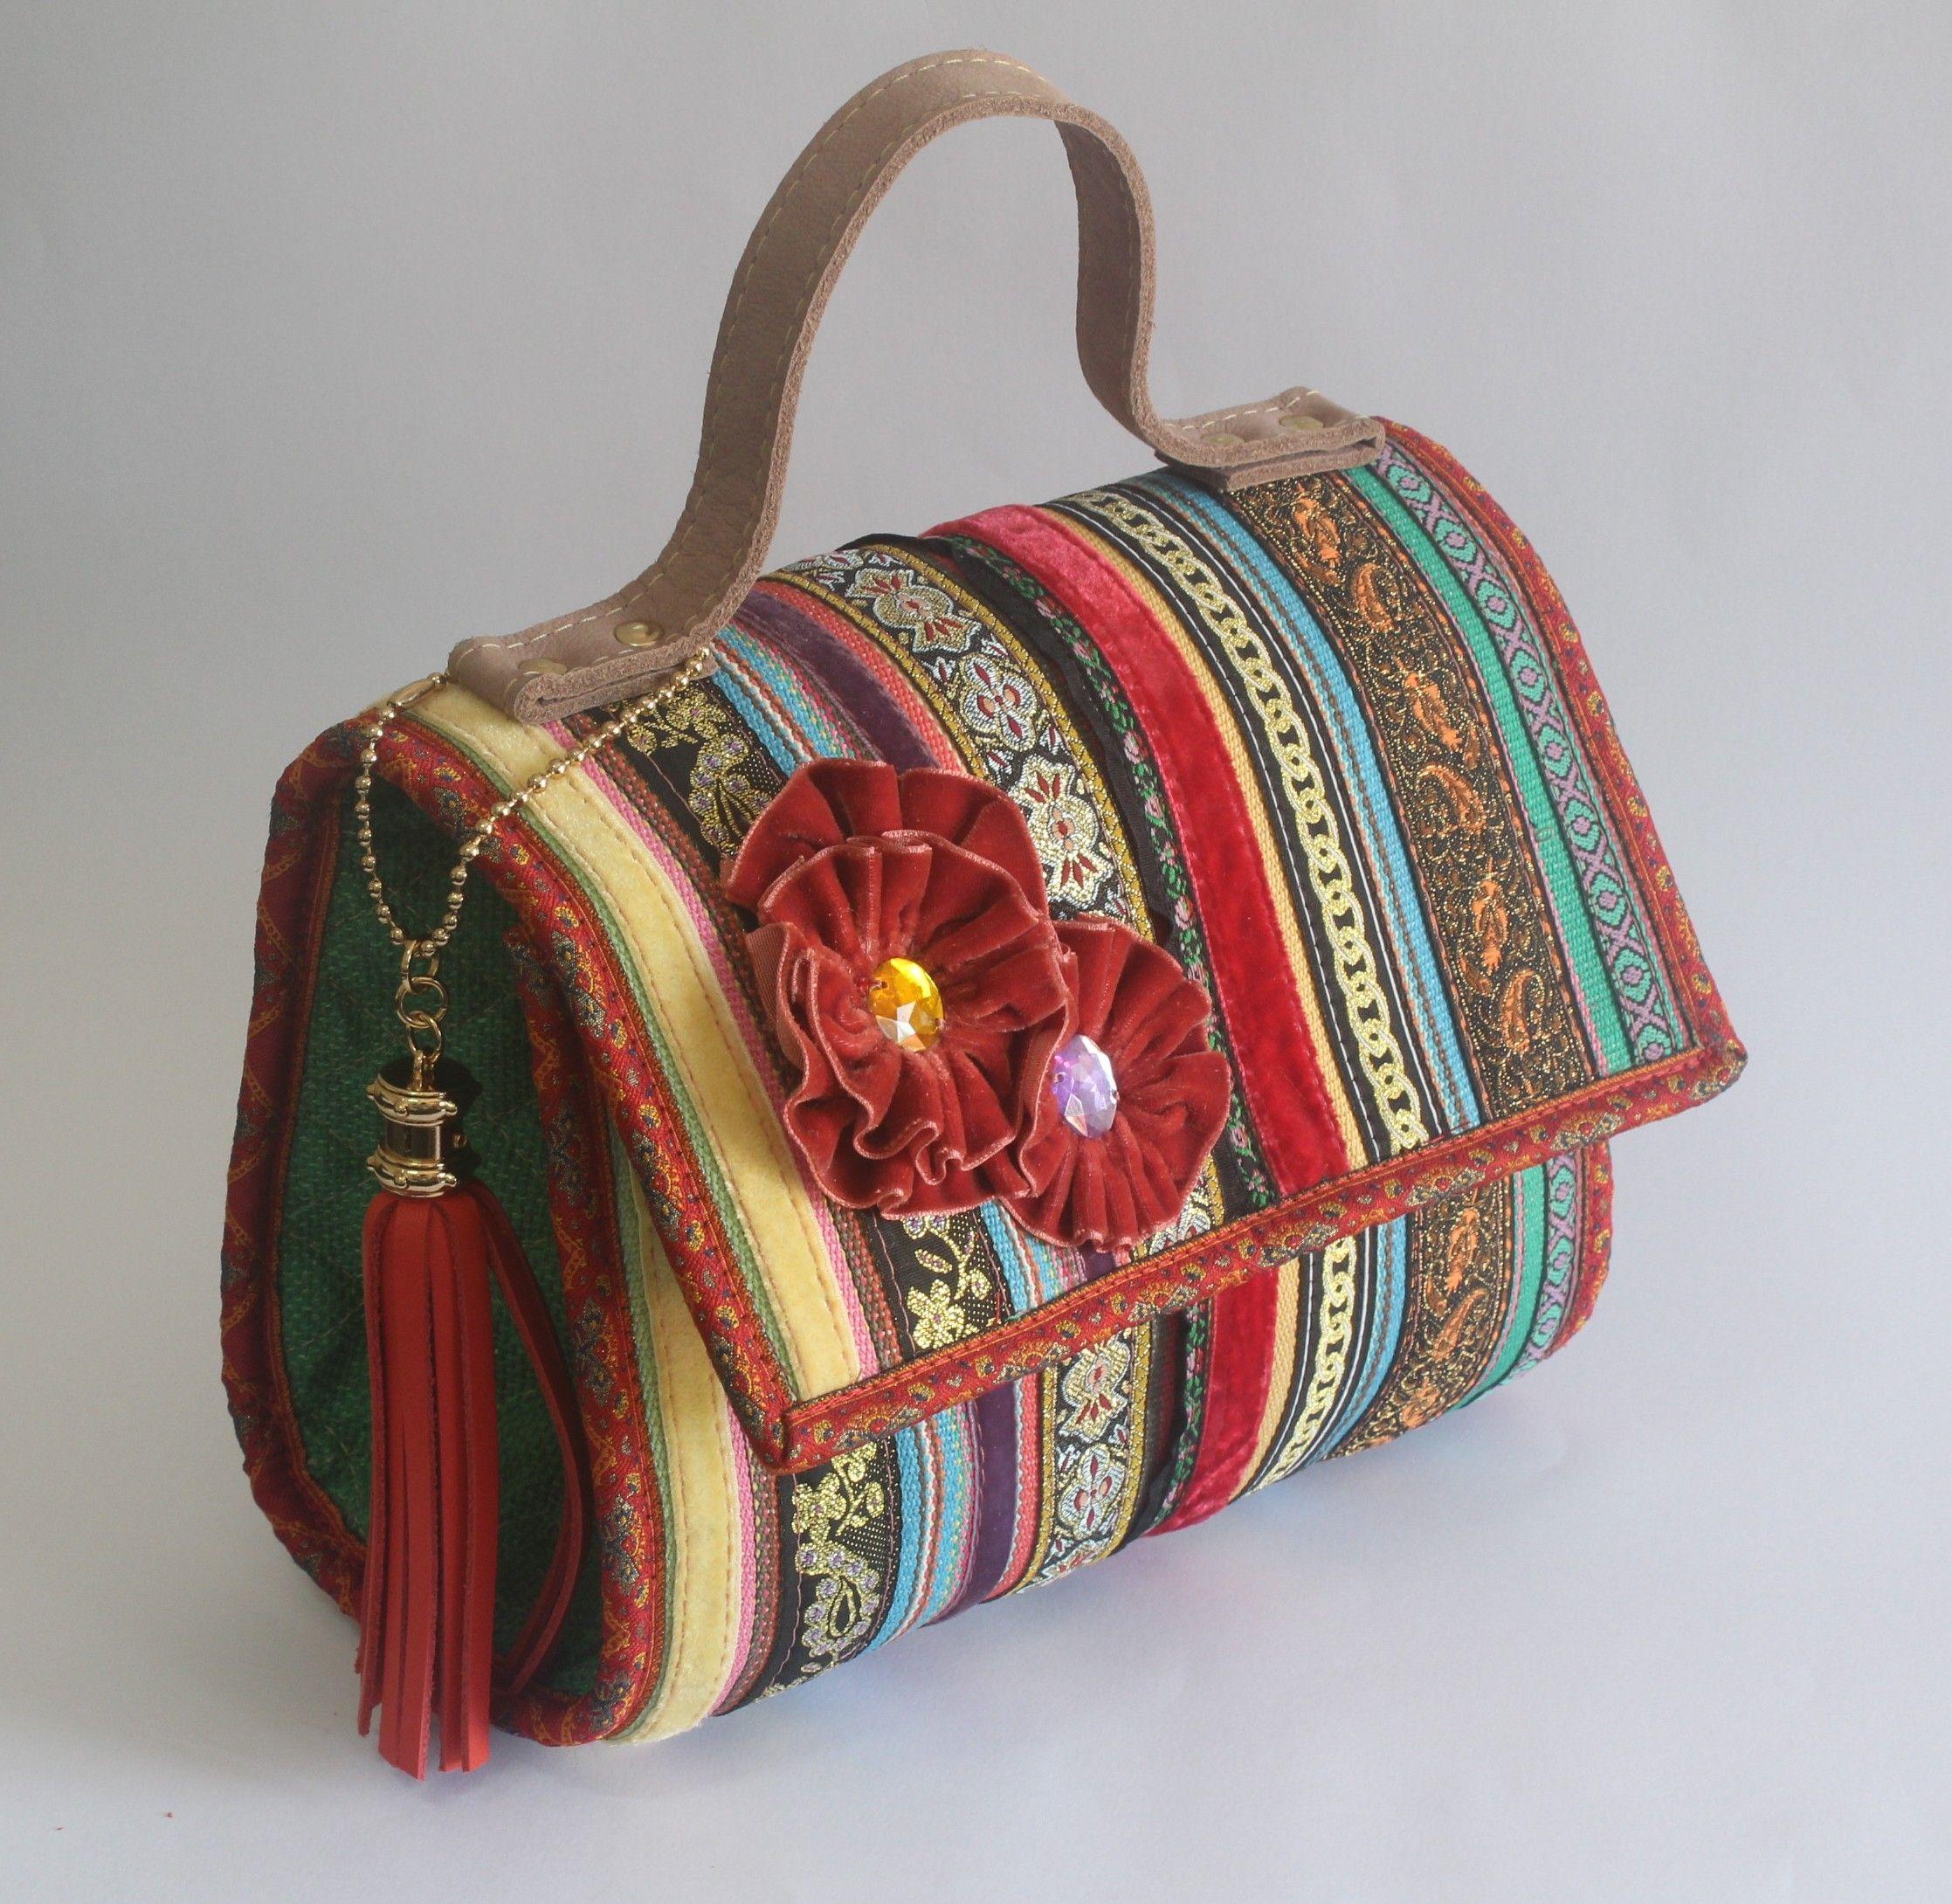 Bolsa De Tecido Artesanal : Bolsa artesanal de fitas pequena puppen